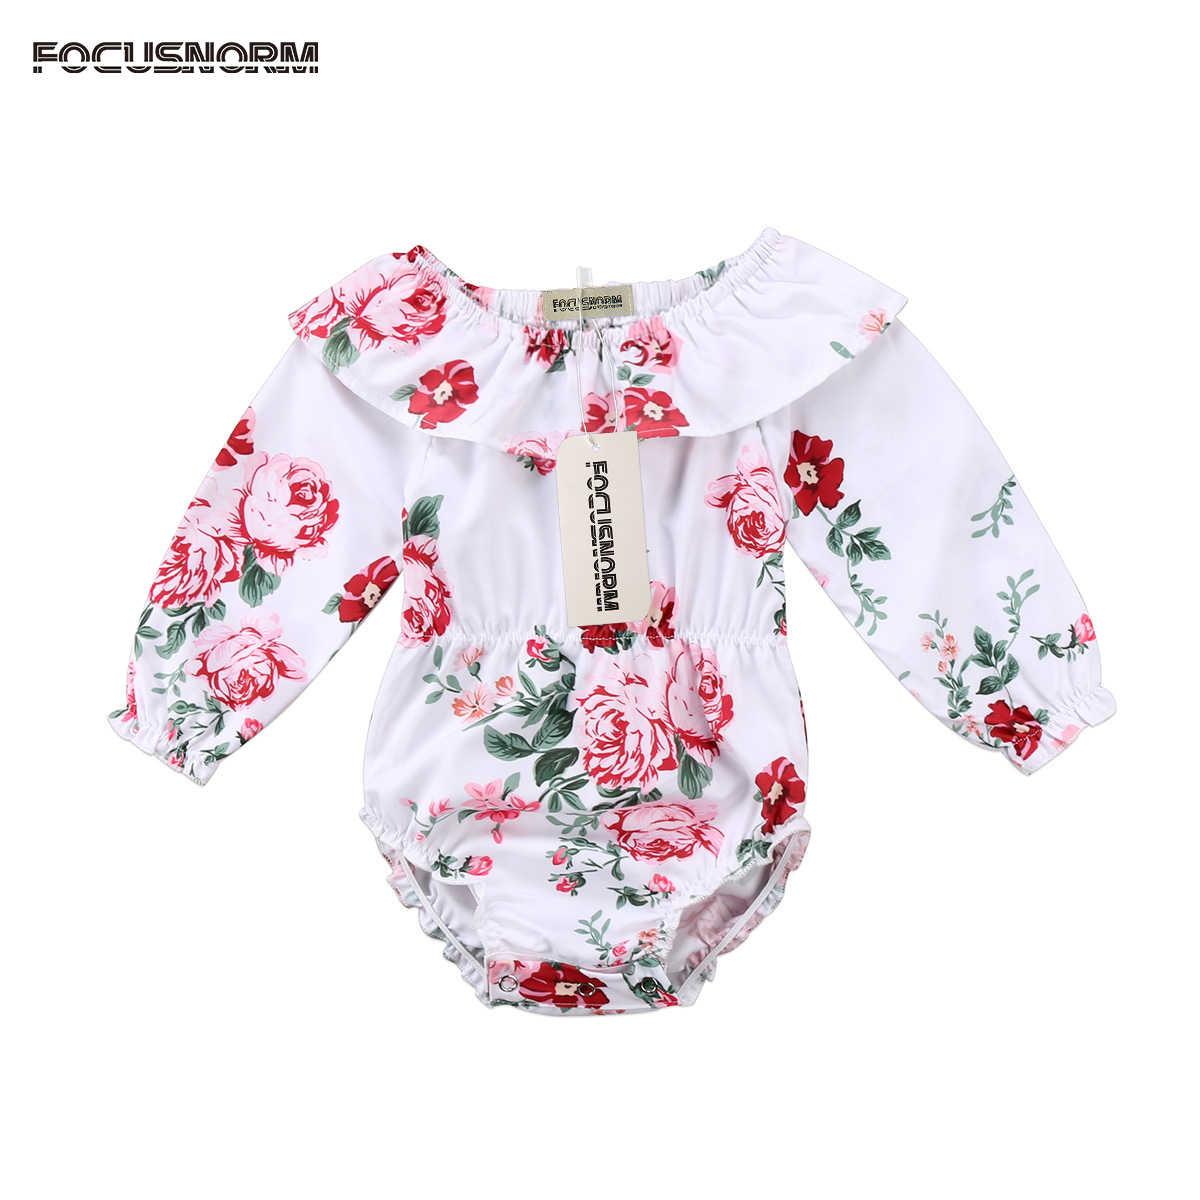 9d12470103c Adorable Floral Newborn Baby Girls Long Sleeve Peter Pan Collar Romper  Summer Kid Elastic Waist Outfits